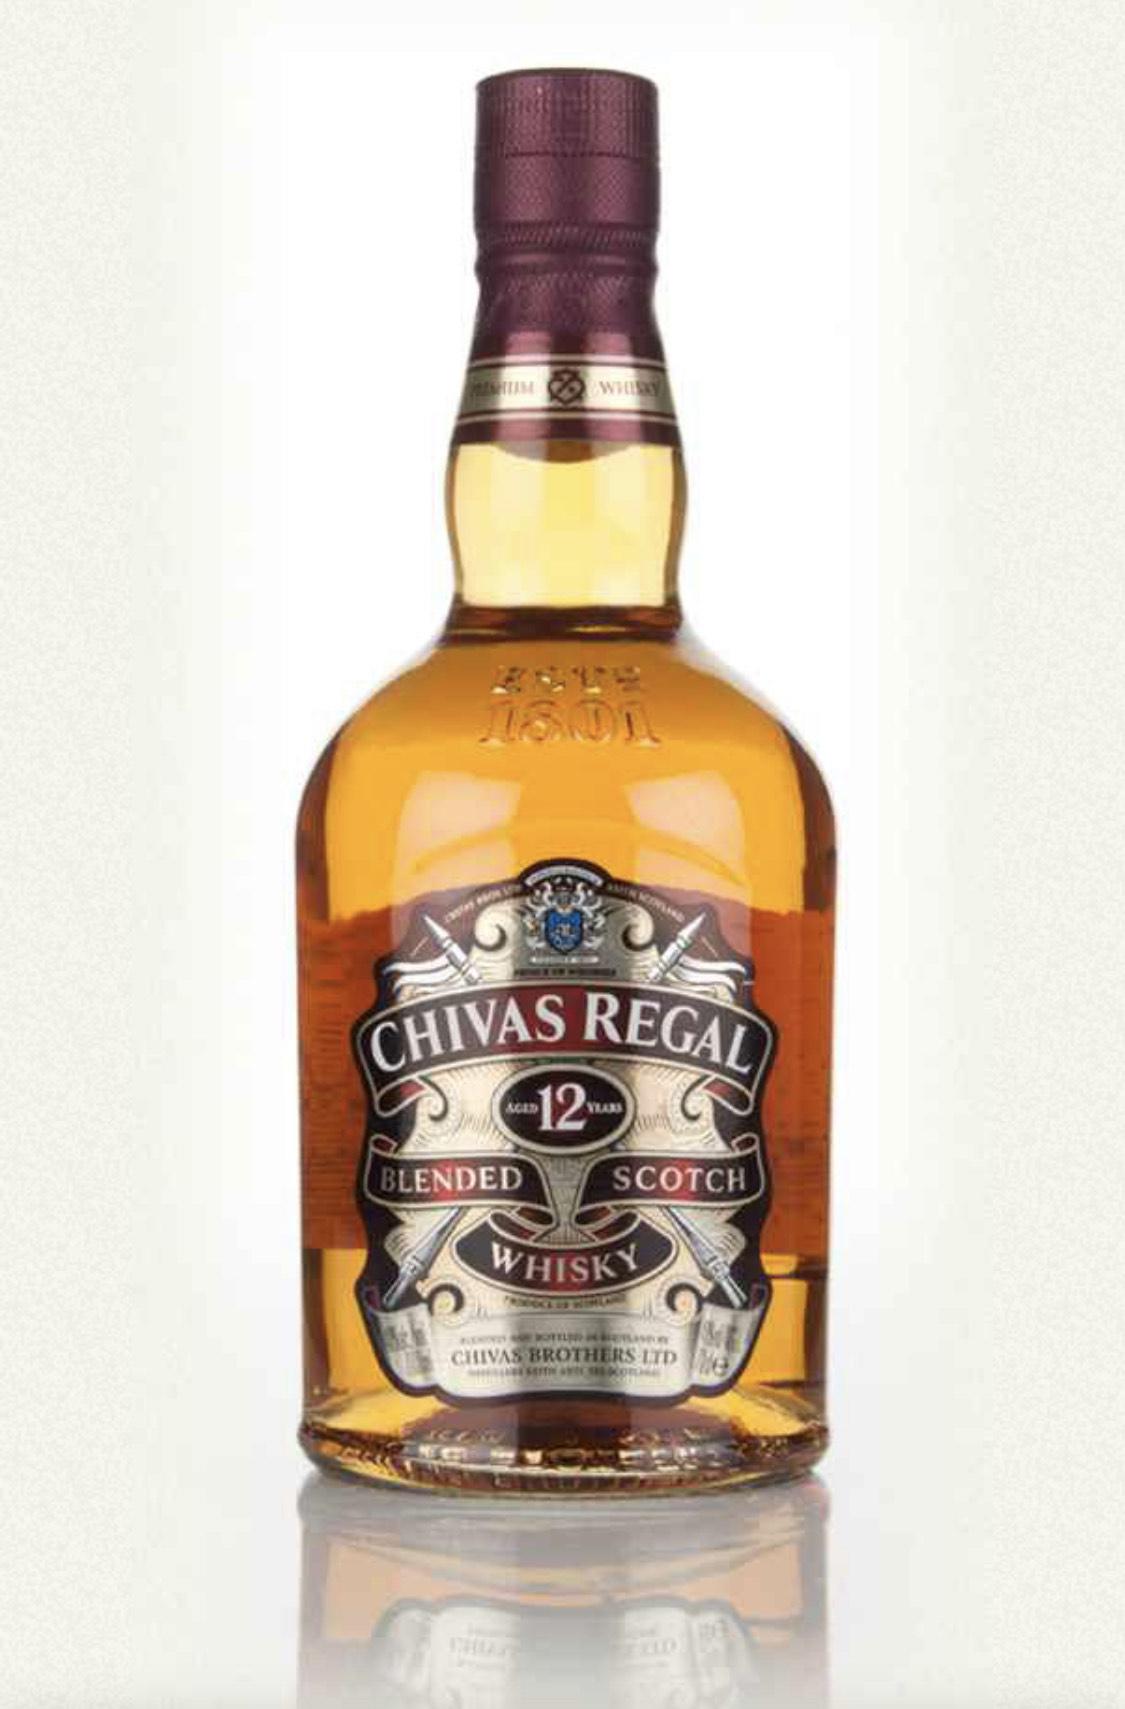 Chivas Regal 12 Year Old Blended Scotch Whisky £20 @ Asda